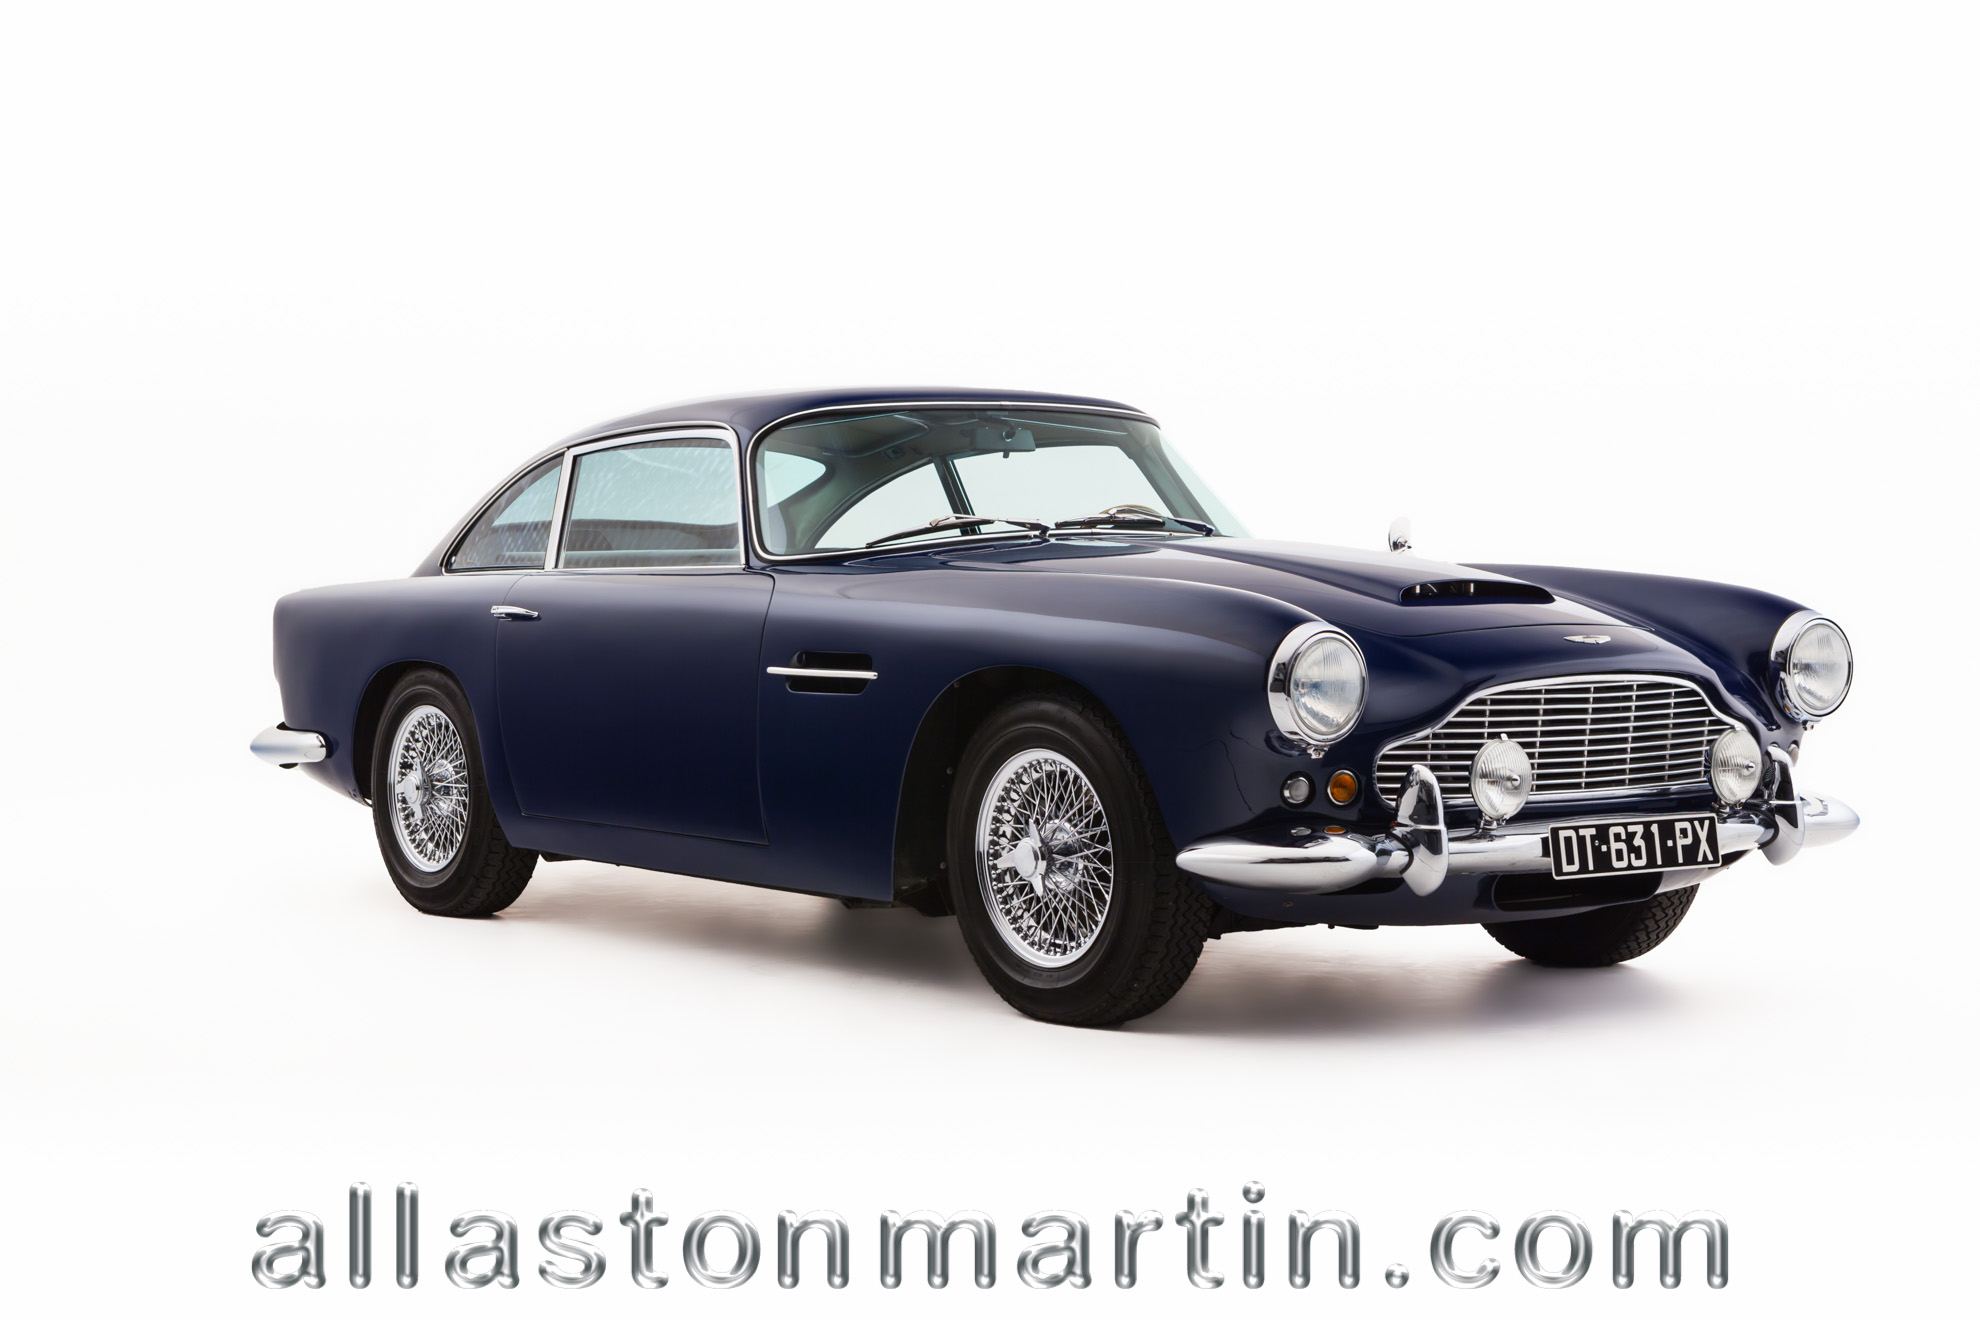 aston martin cars for sale buy aston martin sell aston